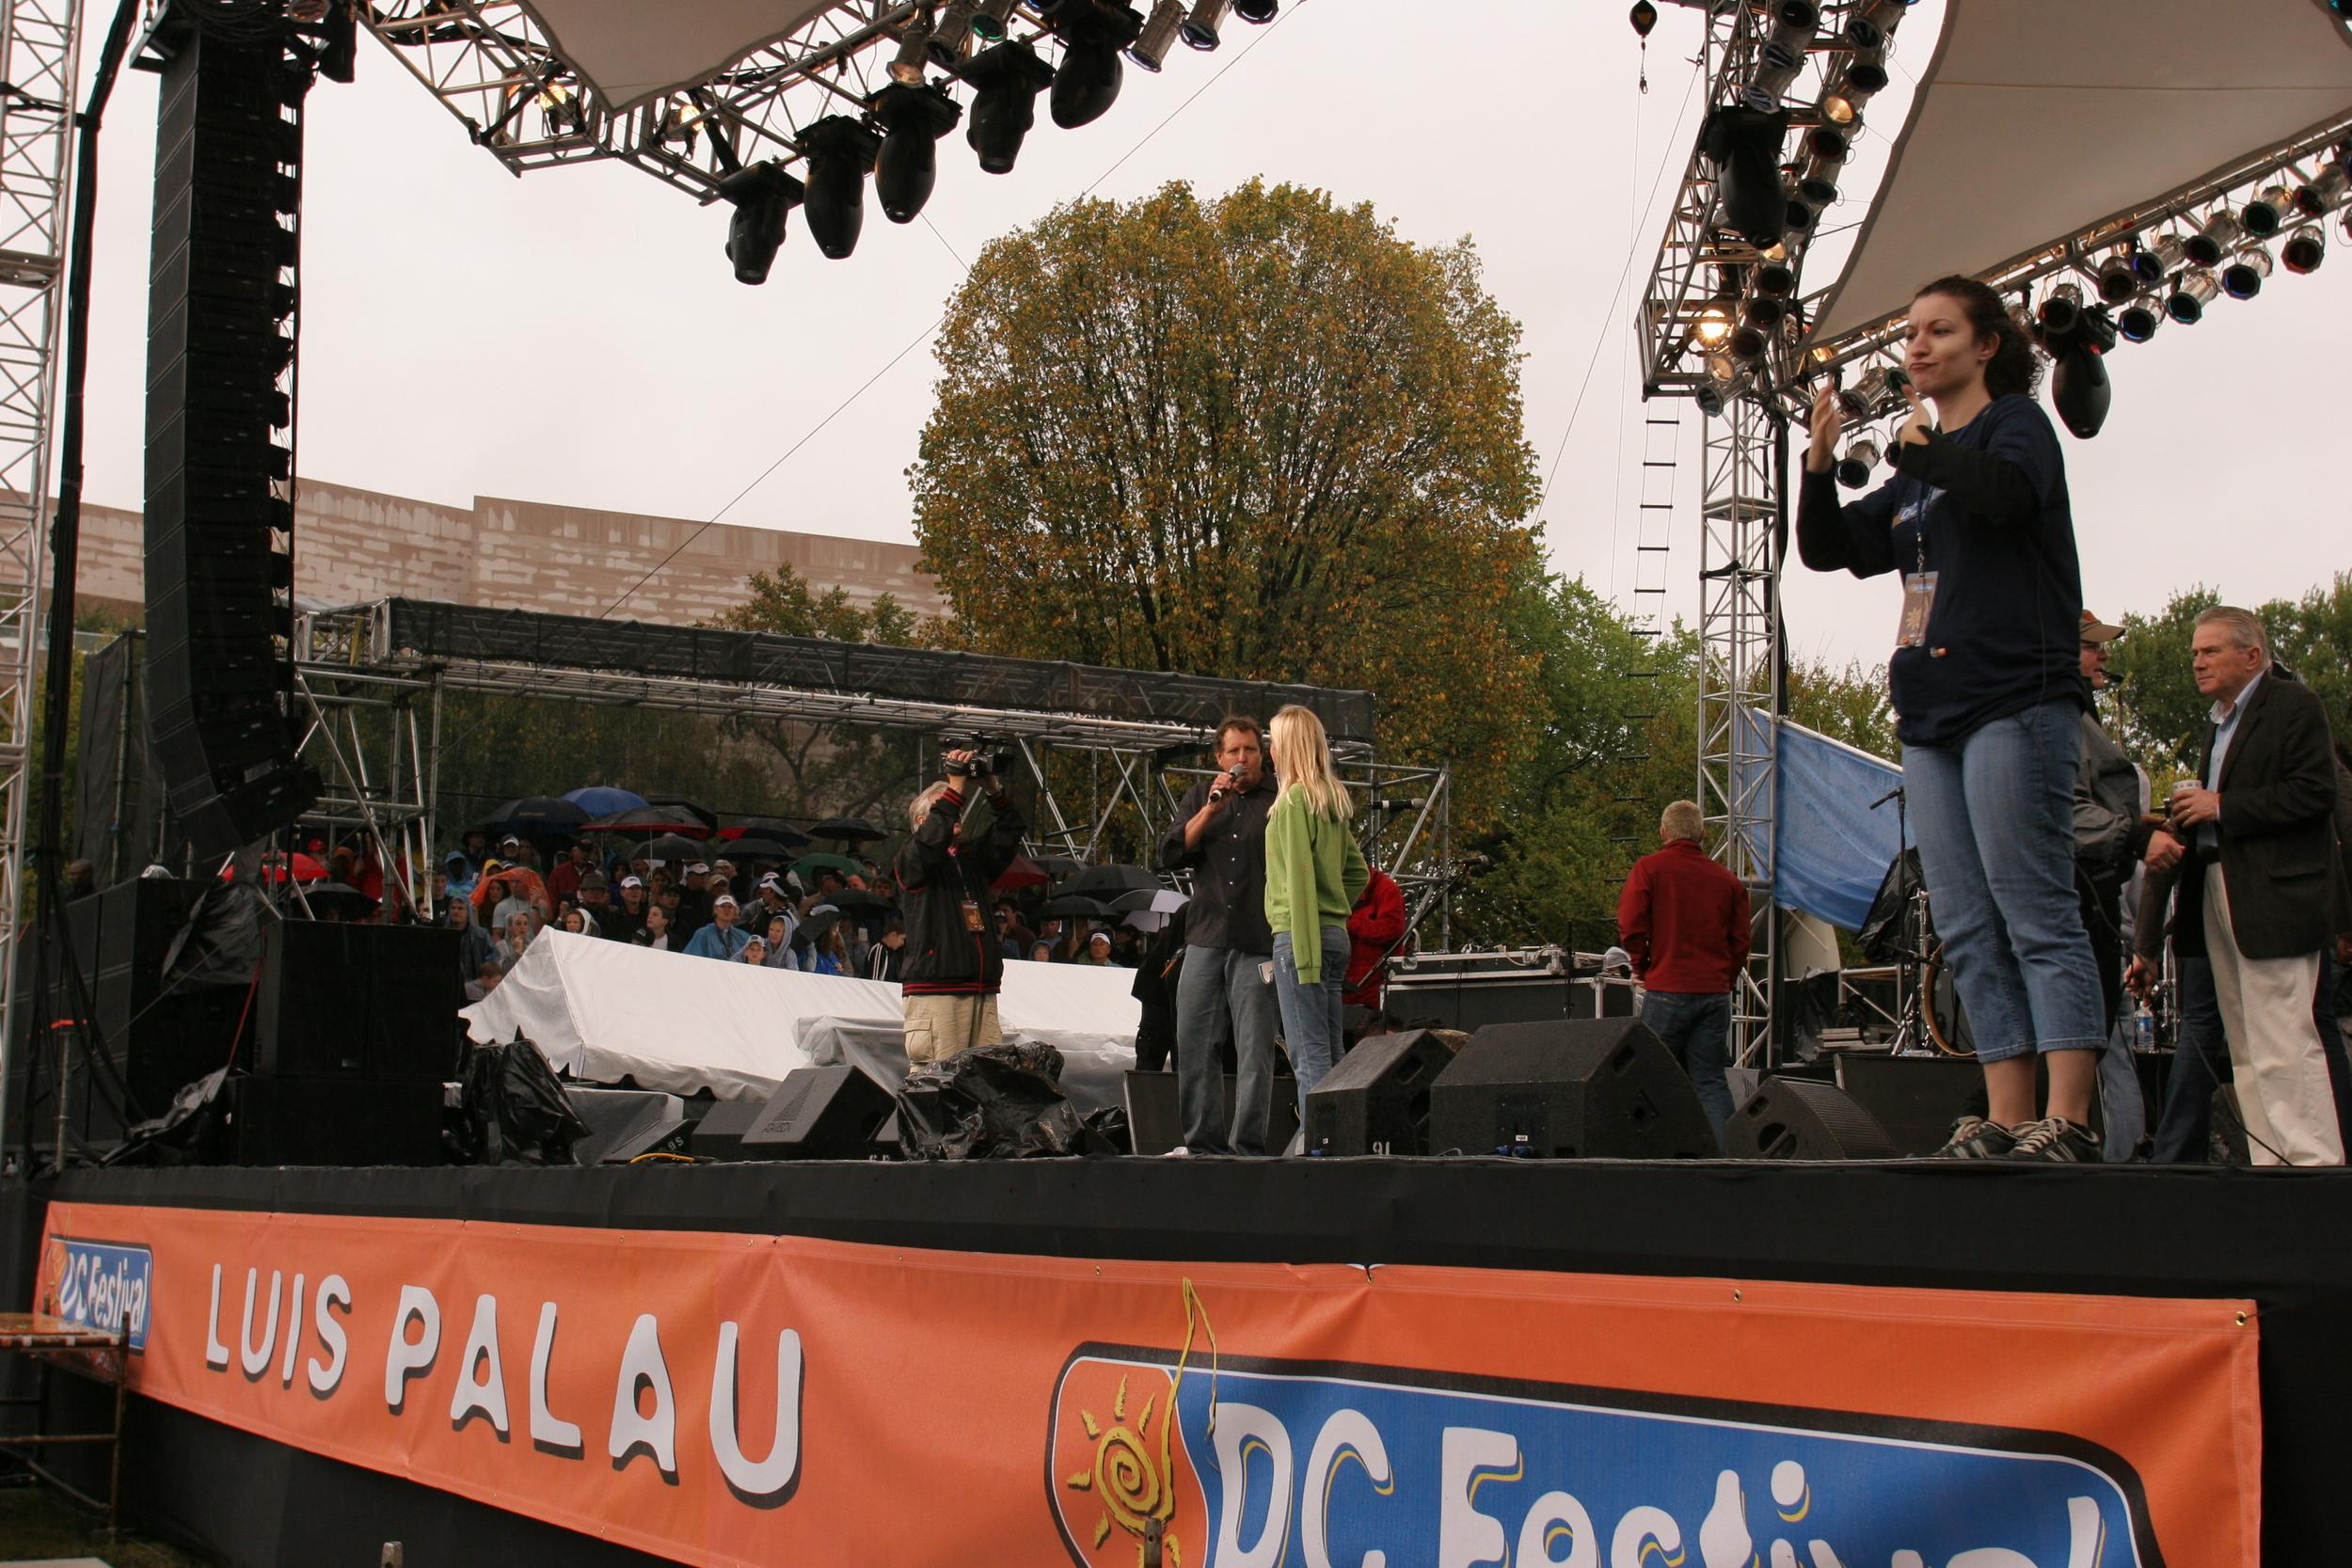 D.C. Festival, 2005